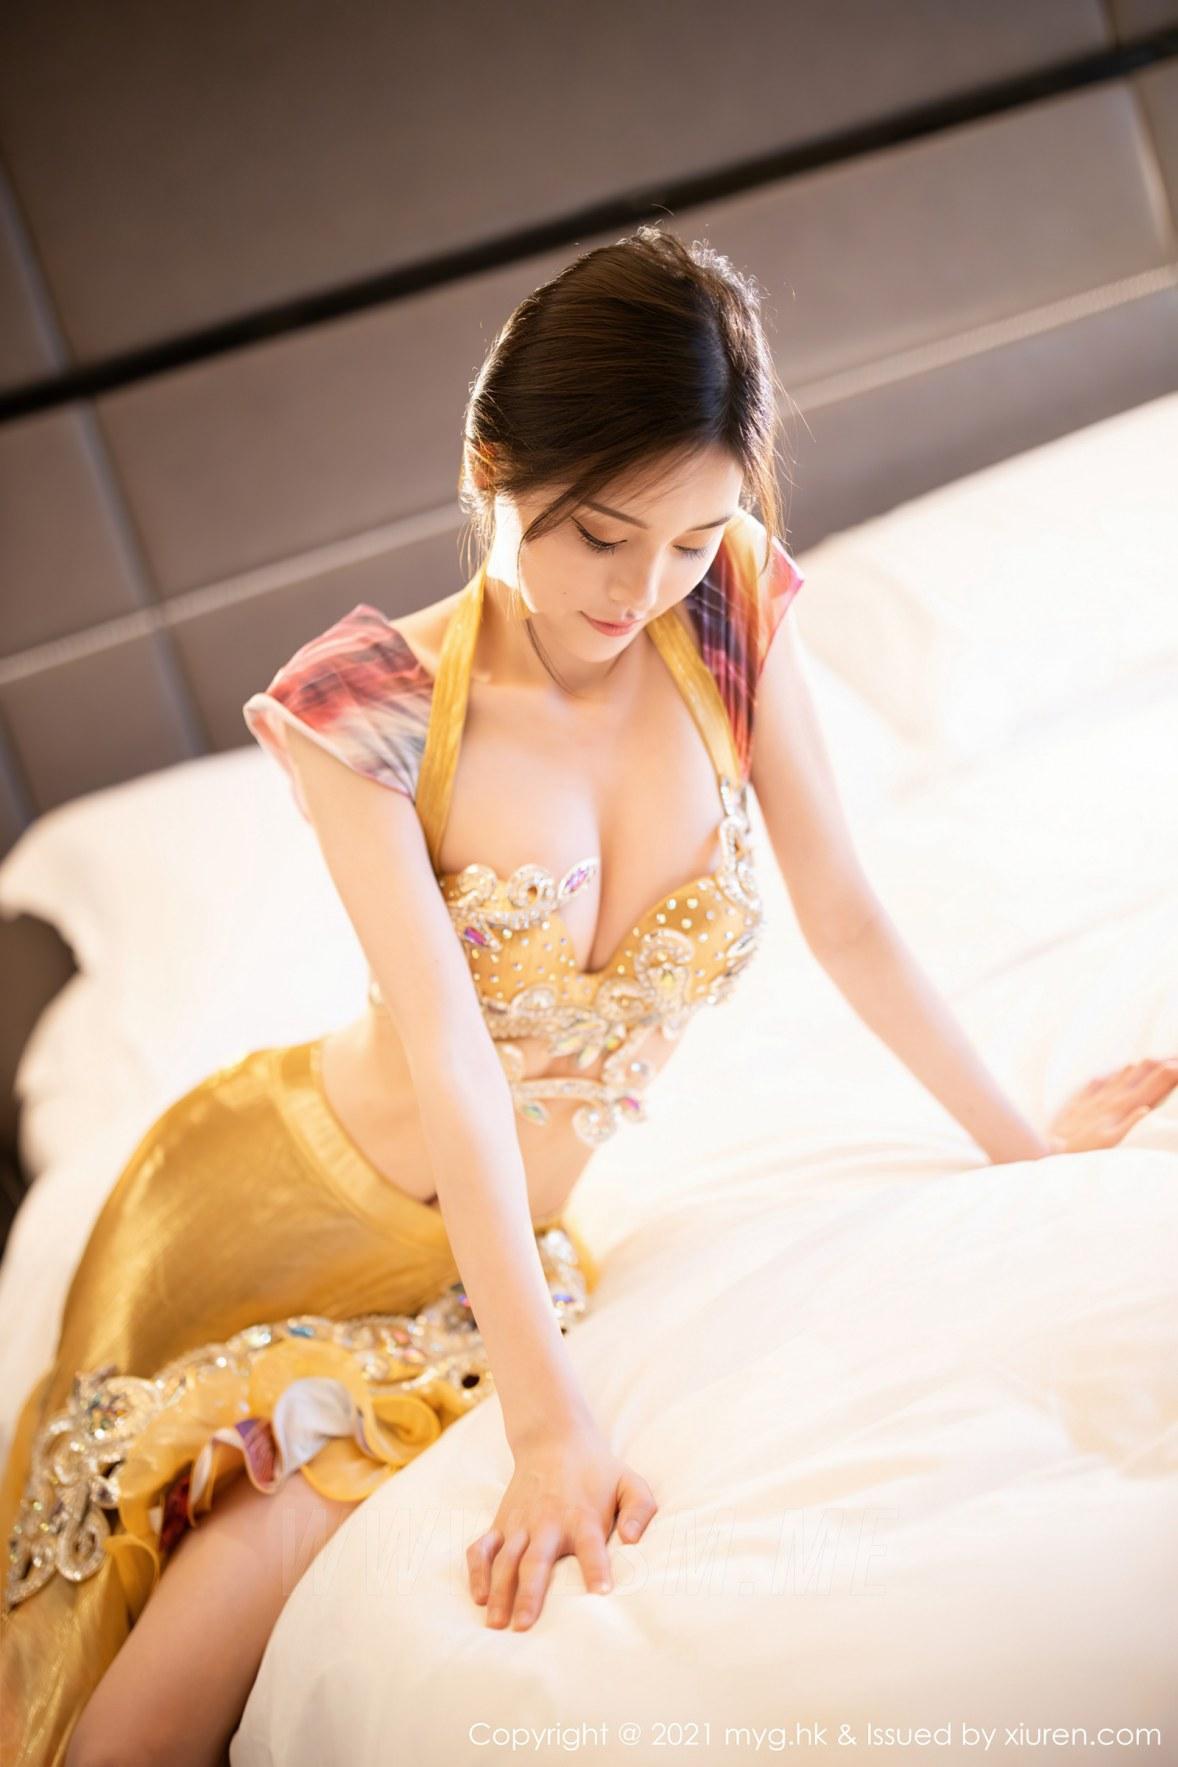 MyGirl 美媛馆 Vol.549 泰式服饰 小夕juju 江浙沪旅拍33 - 3